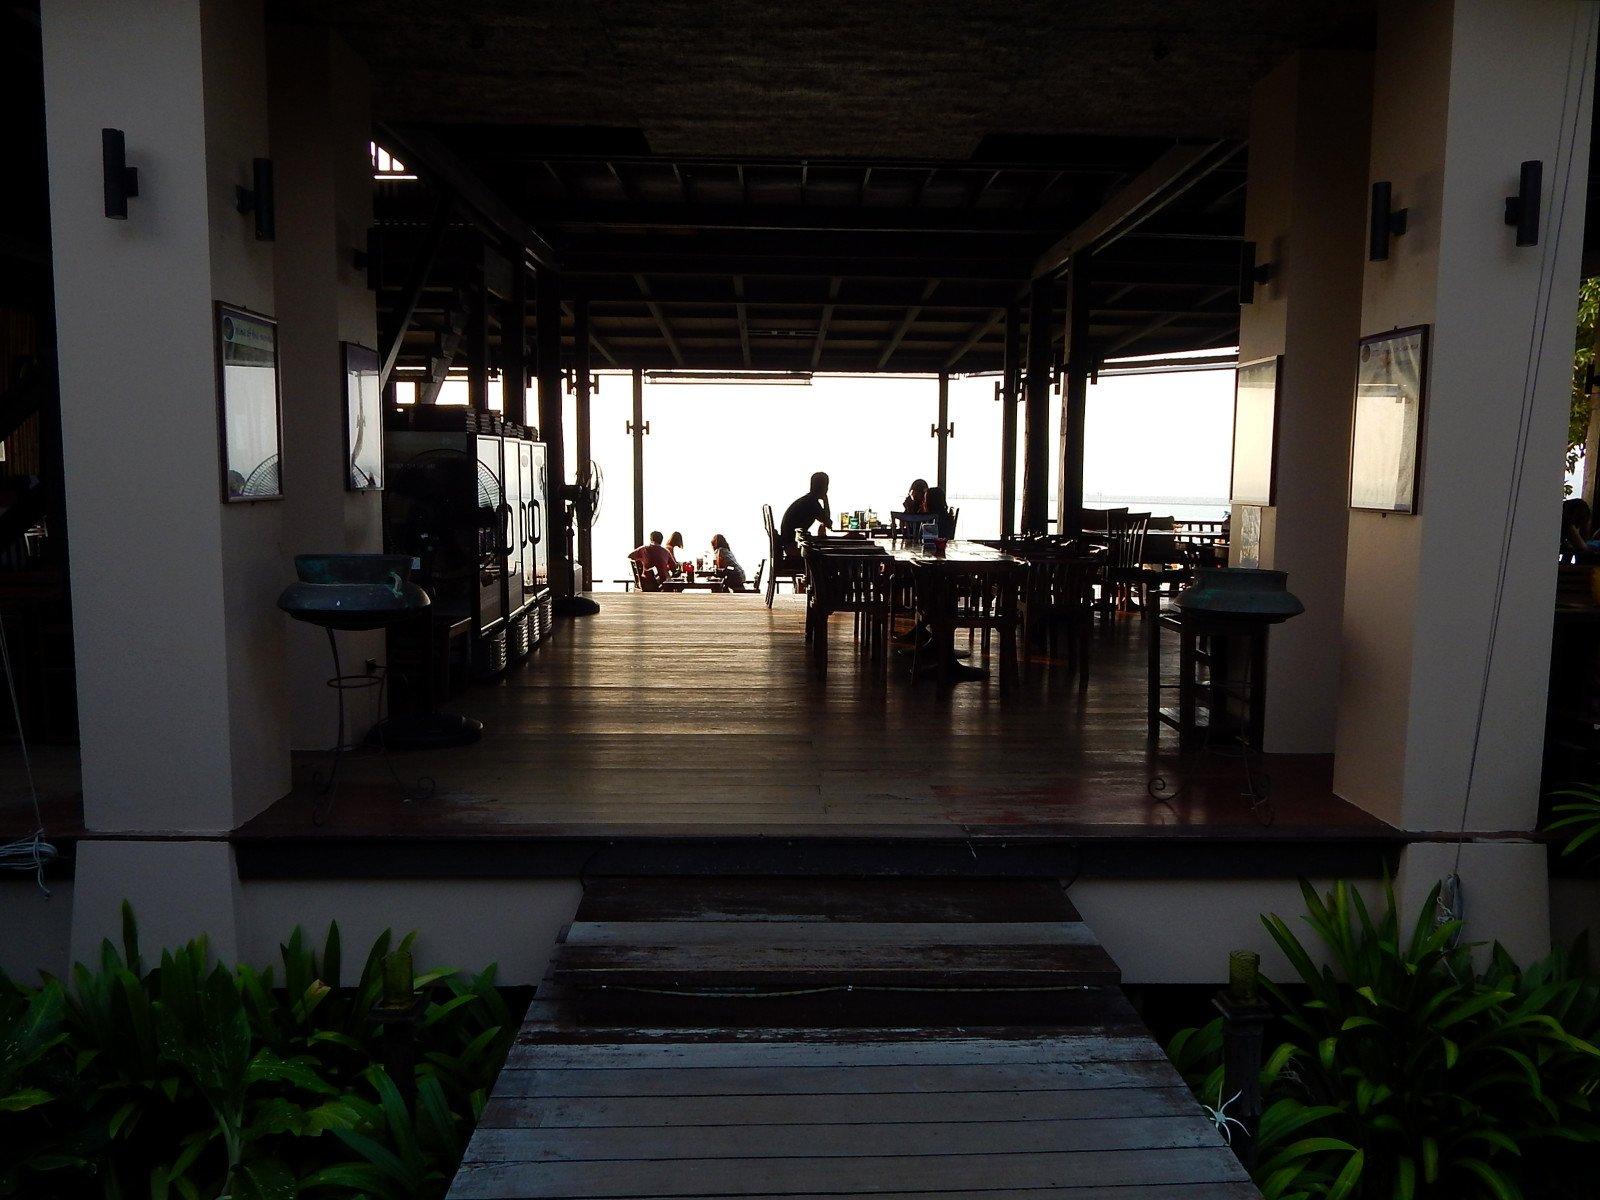 Rimpa Lapin Pattaya Thailand Thailand Discovery